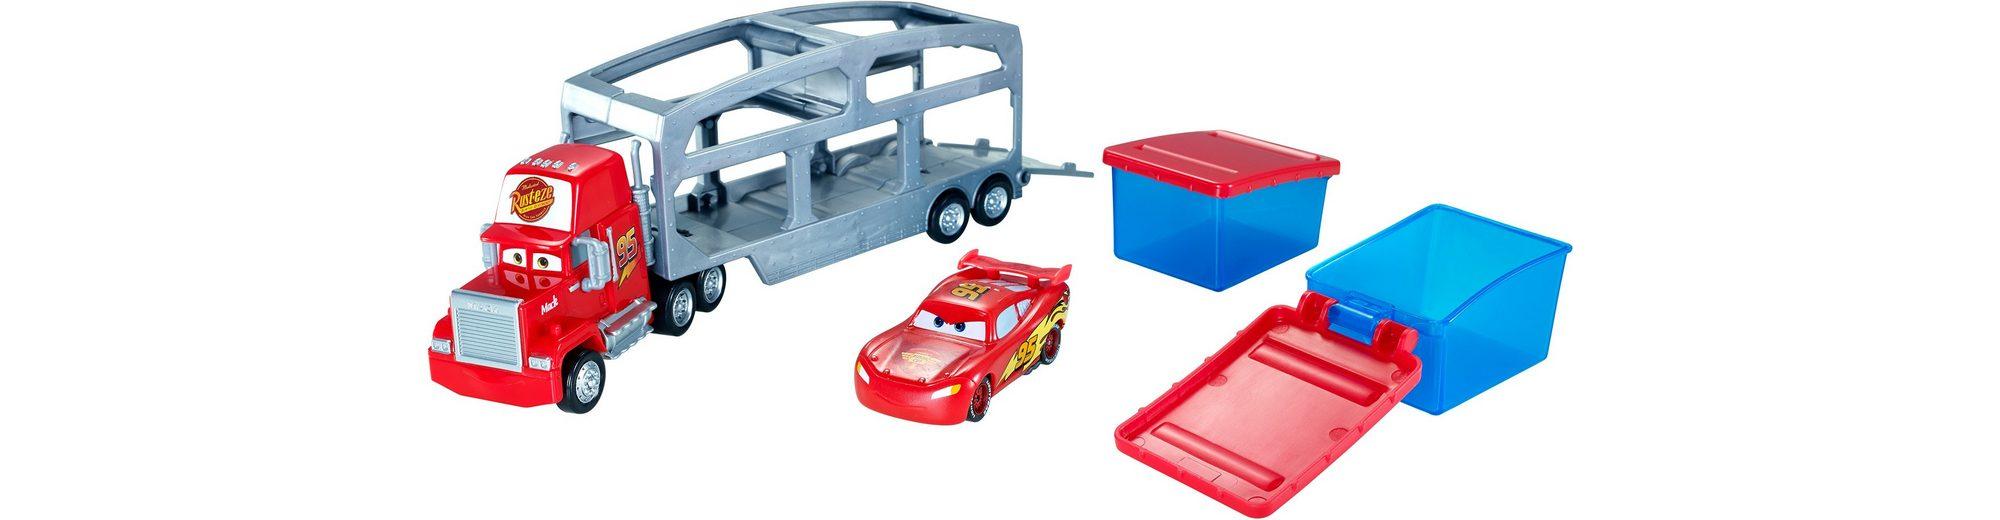 Mattel Spielzeugautoset, »Disney Pixar Cars Macks Farbwechsel Station«